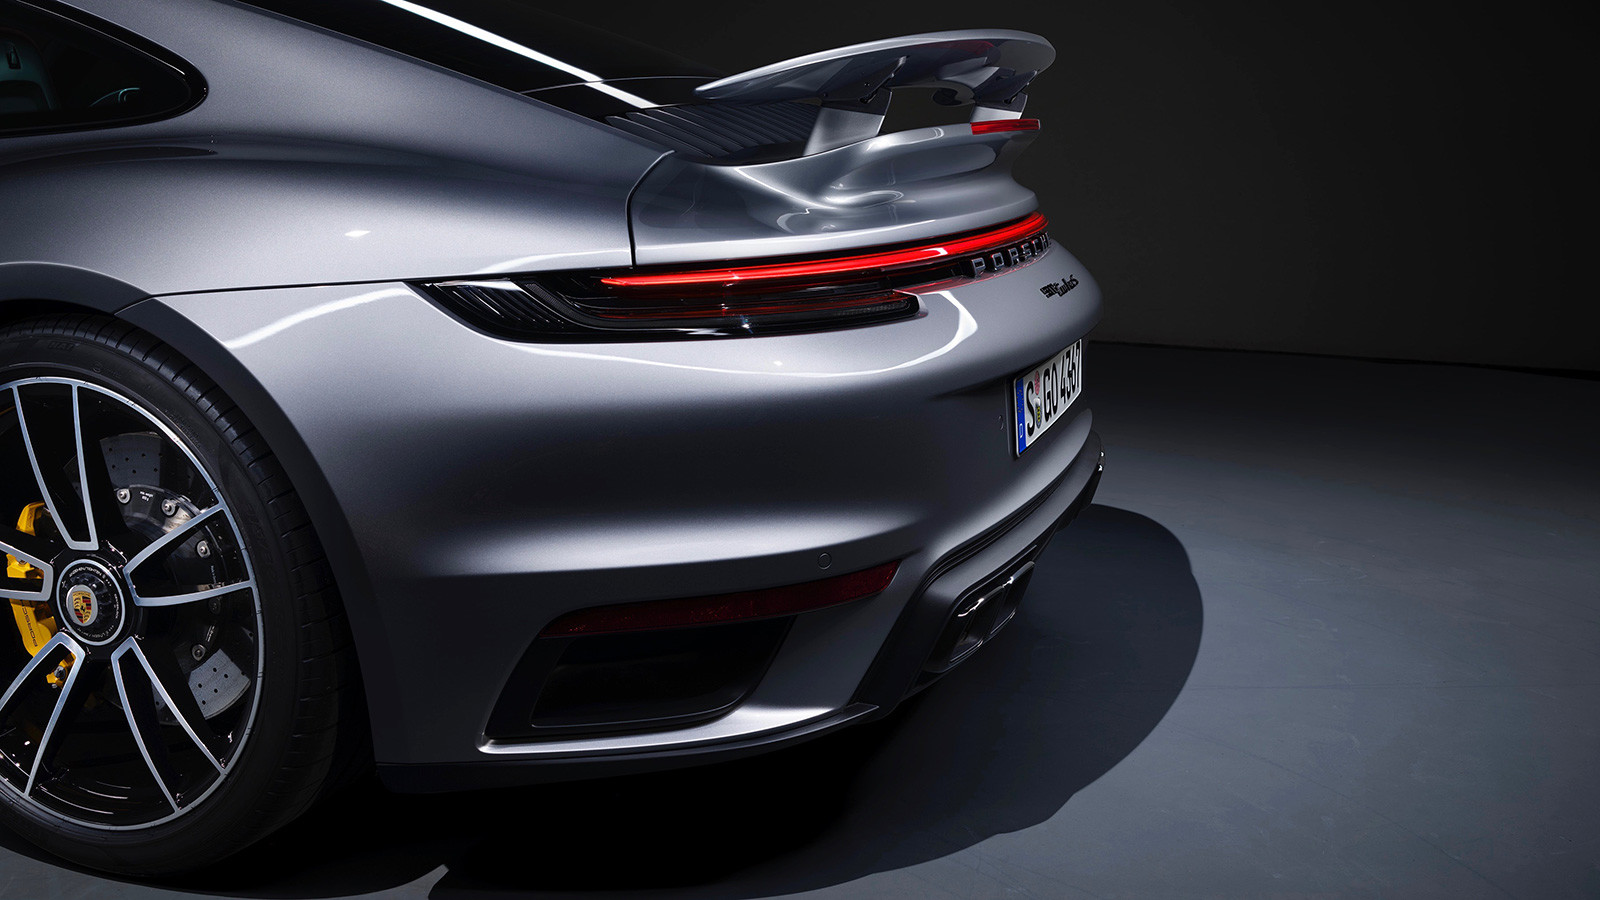 Foto de Porsche 911 Turbo S 2020 (13/18)